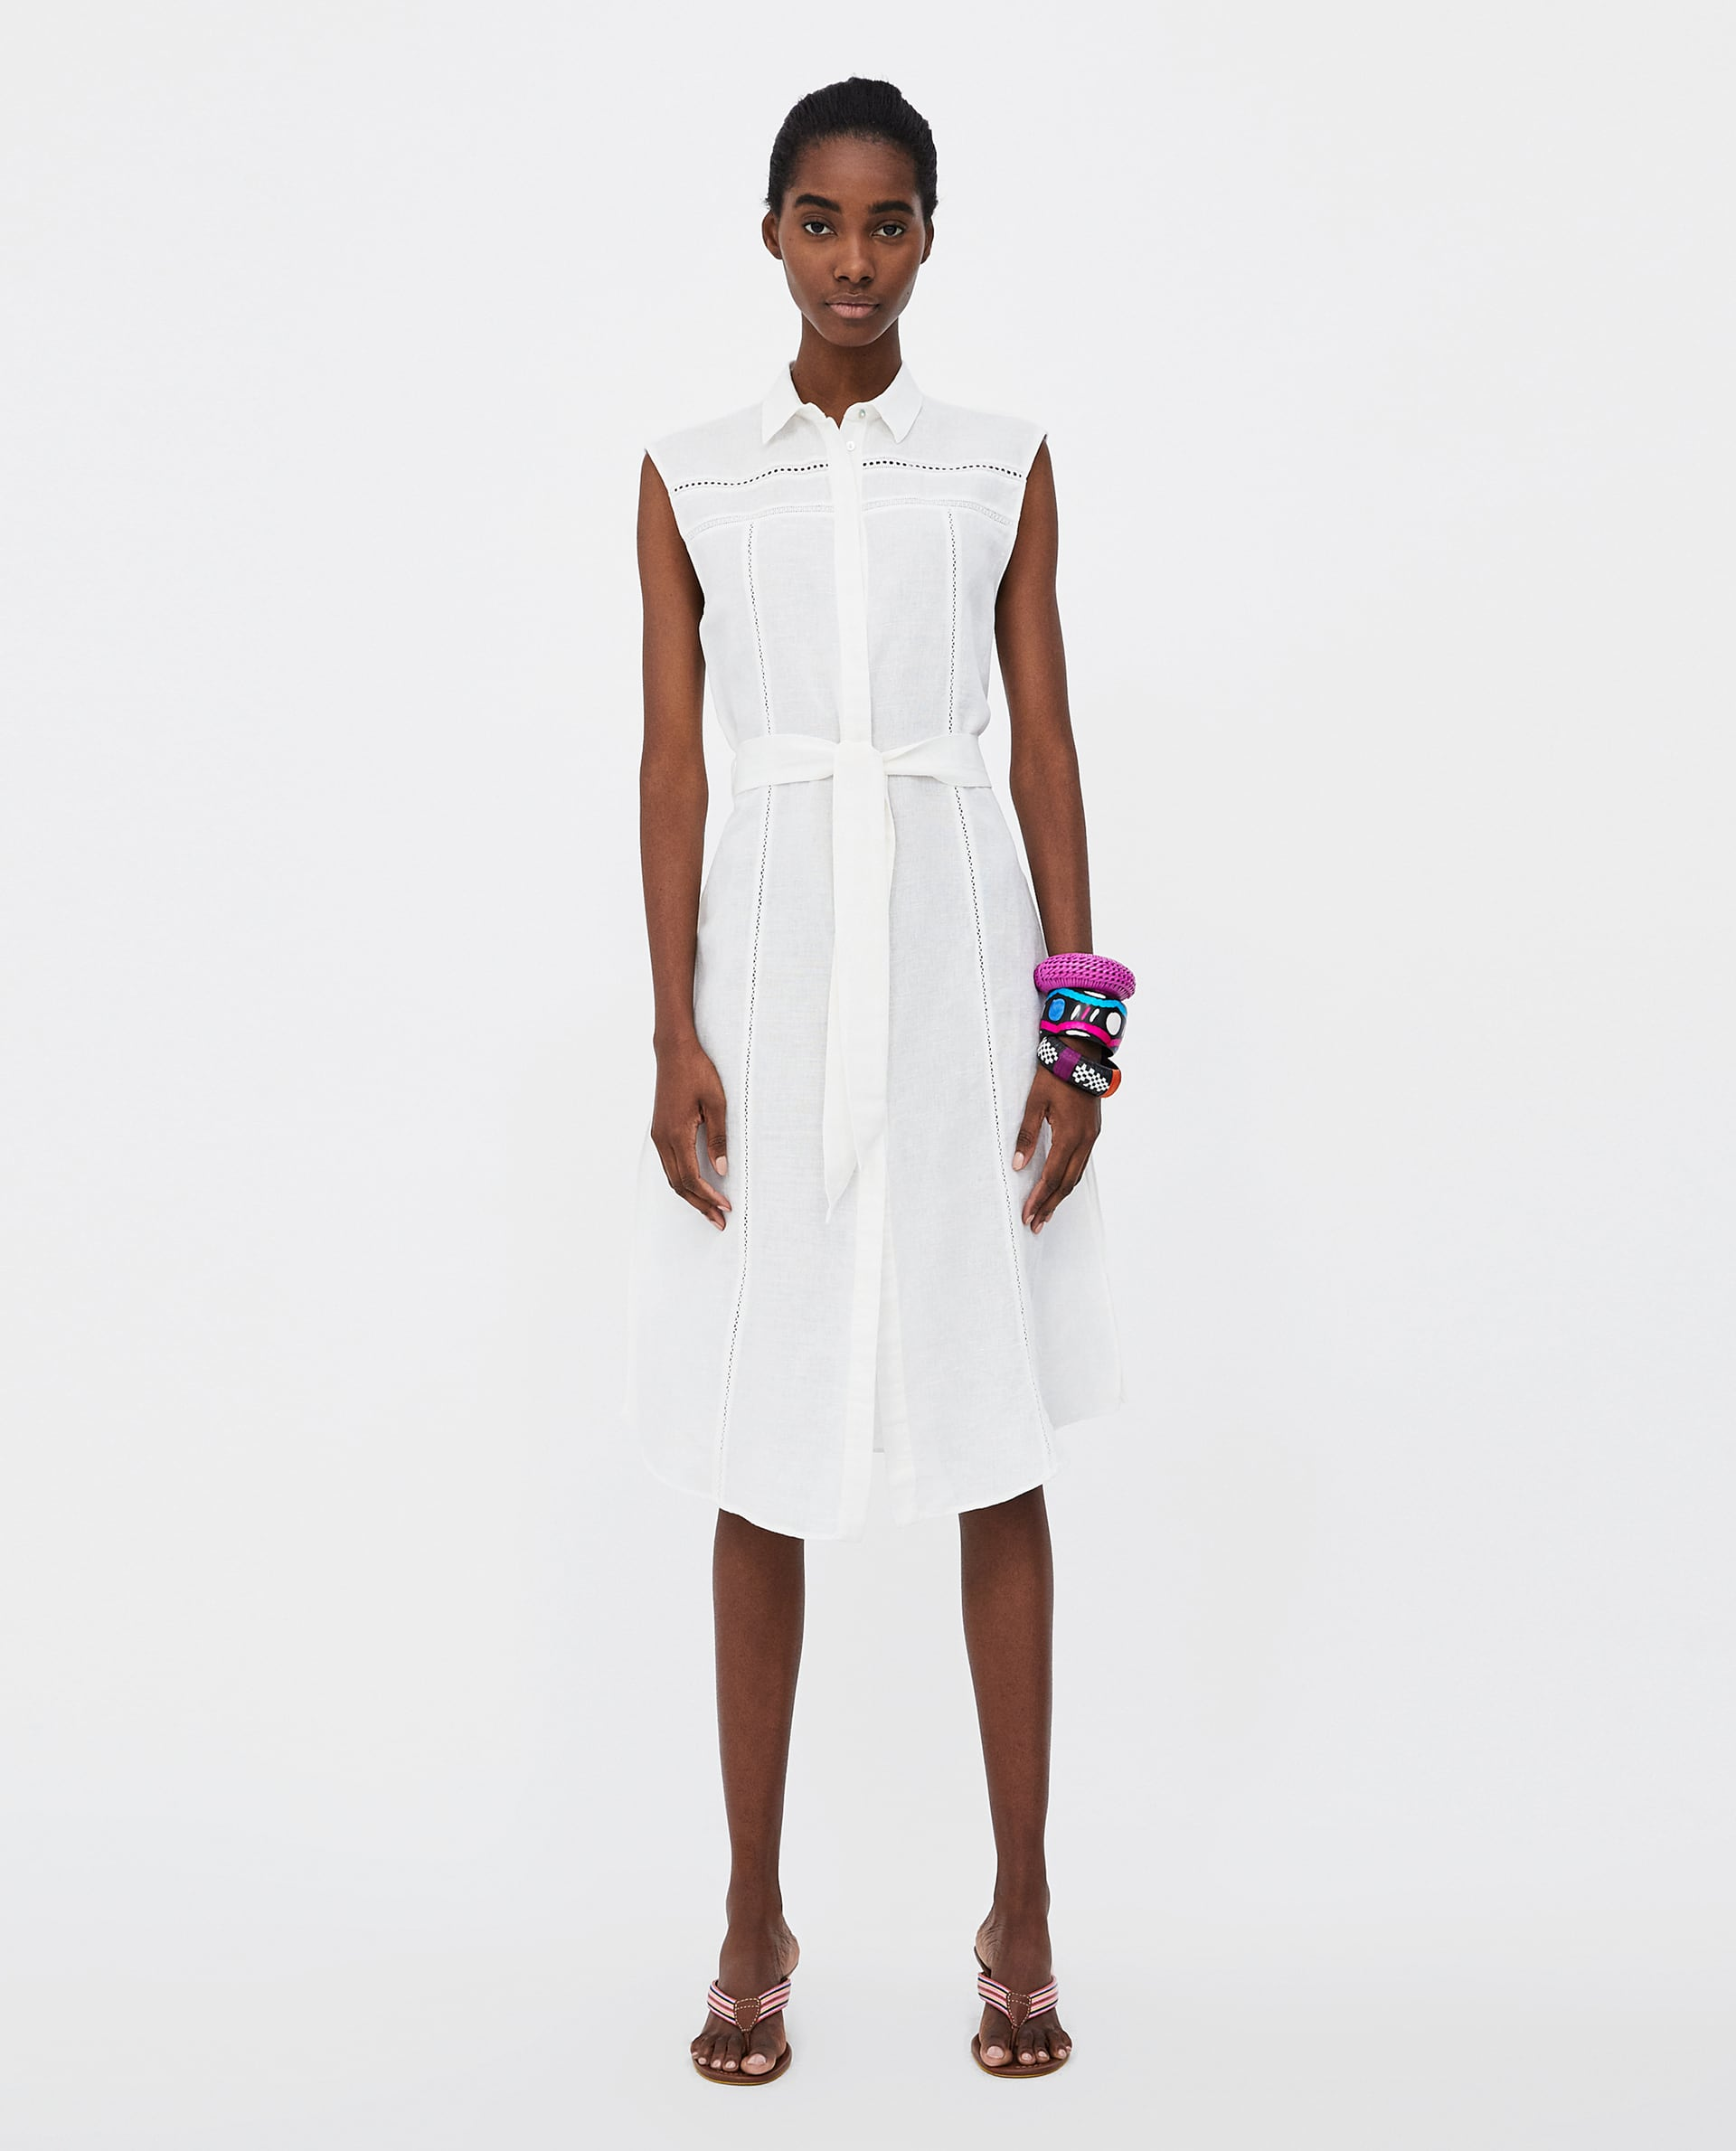 e47dcbca341 ZARA: 10+1 λευκά φορέματα για το καλοκαίρι | Economy 365